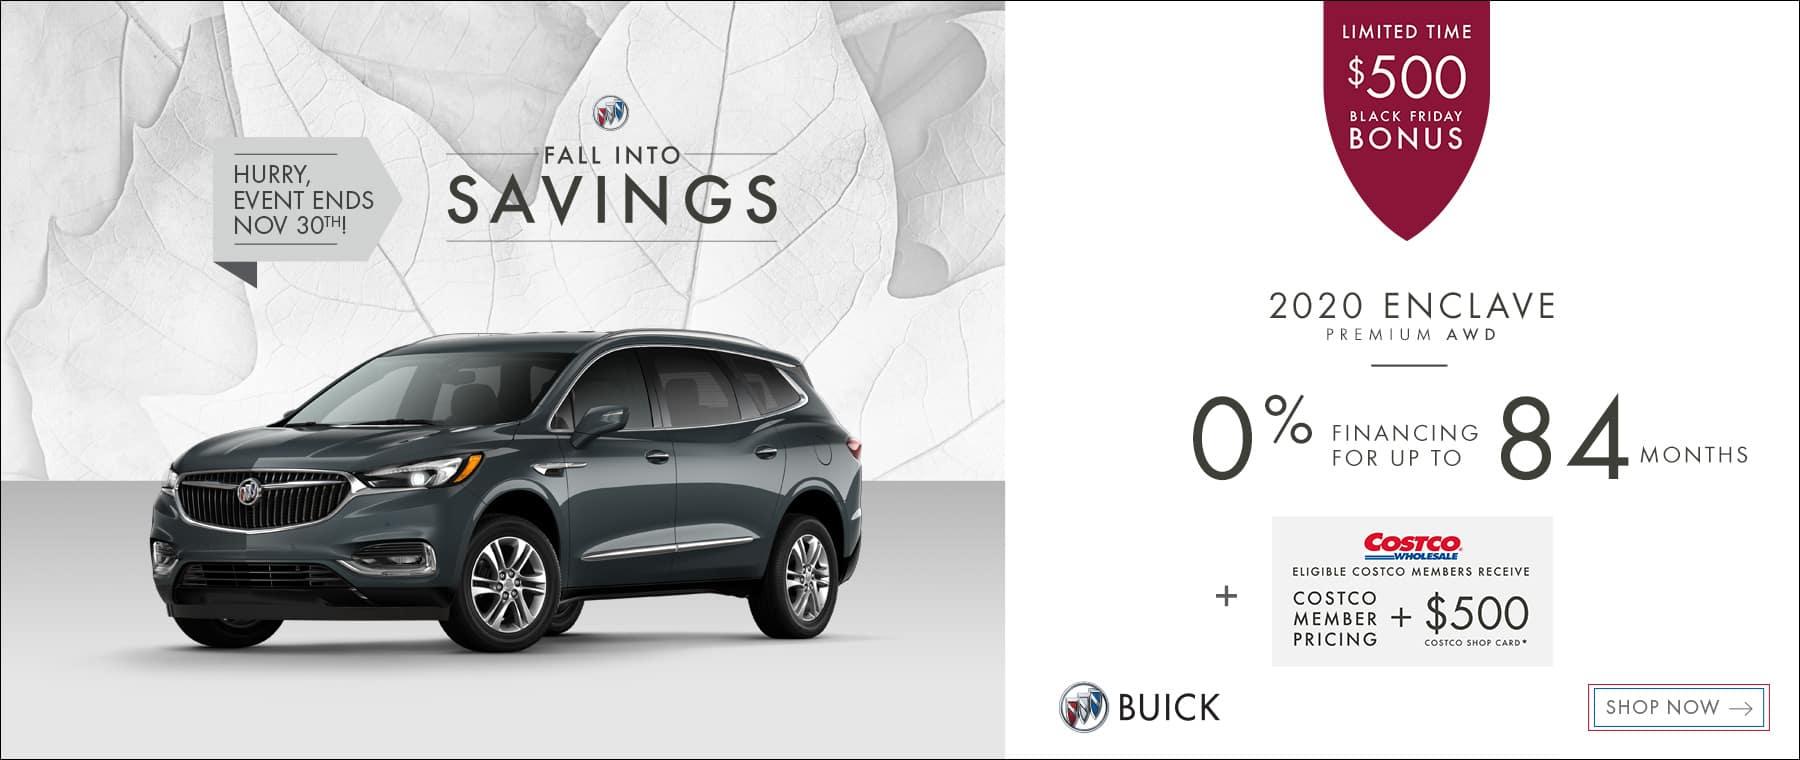 2020_WST_NOV_Buick-BlackFriday_ENCLAVE_PREMIUM_AWD_T3_1800X760_v1